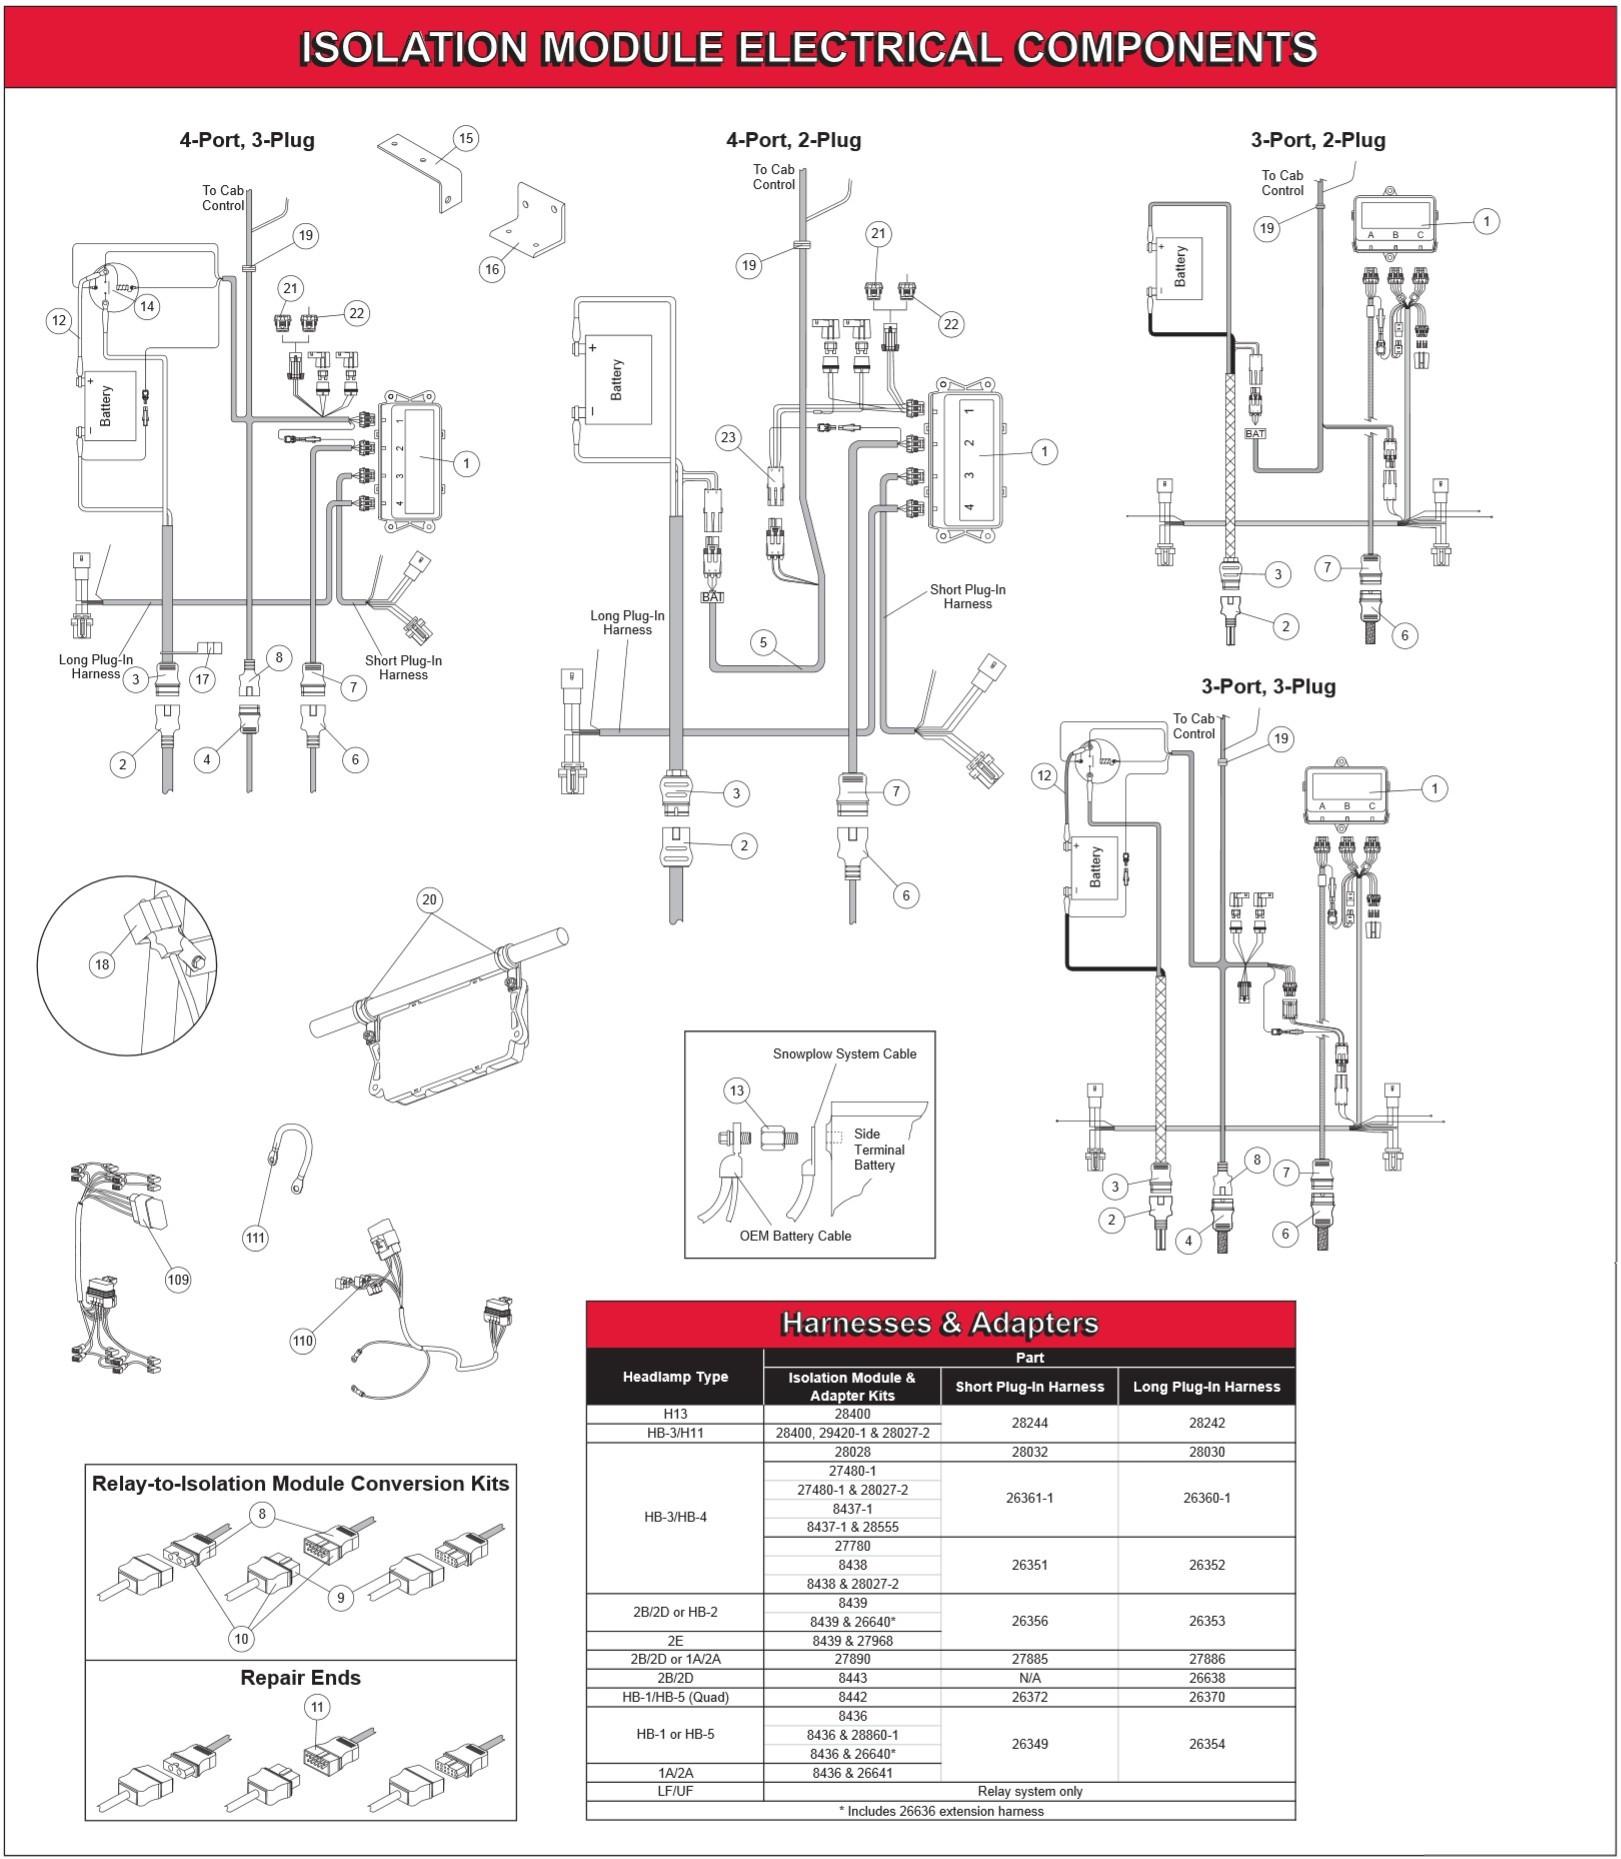 Chevy Western Plow Wiring Diagram - Wiring Diagram Database - Western Plow Solenoid Wiring Diagram